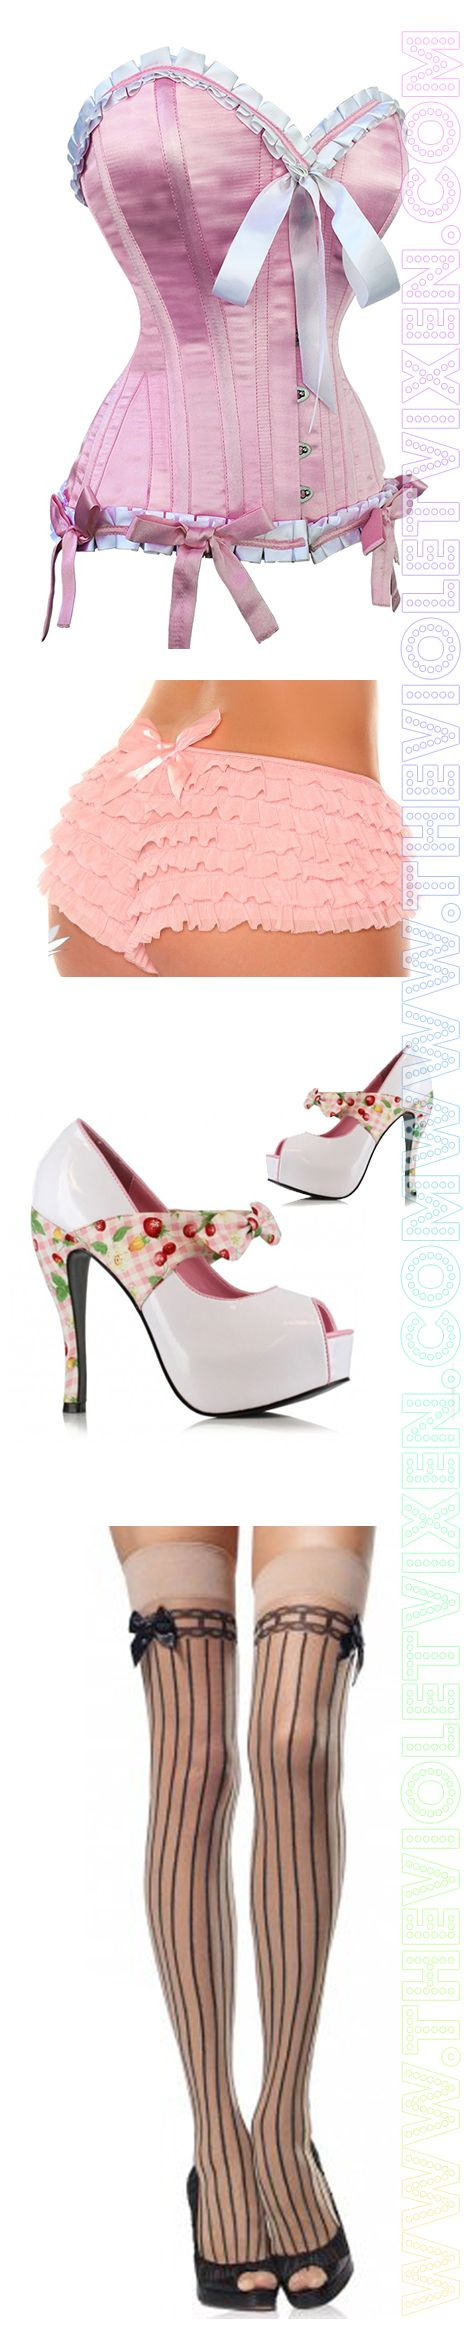 Pink Pin-Up Pretty corset, ruffle panties, picnic cherry wrap platform heels and knee high stockings. Pin up <3 <3 Steel boned waist training pink satin corset with white bows! <3 Sugar! www.thevioletvixen.com